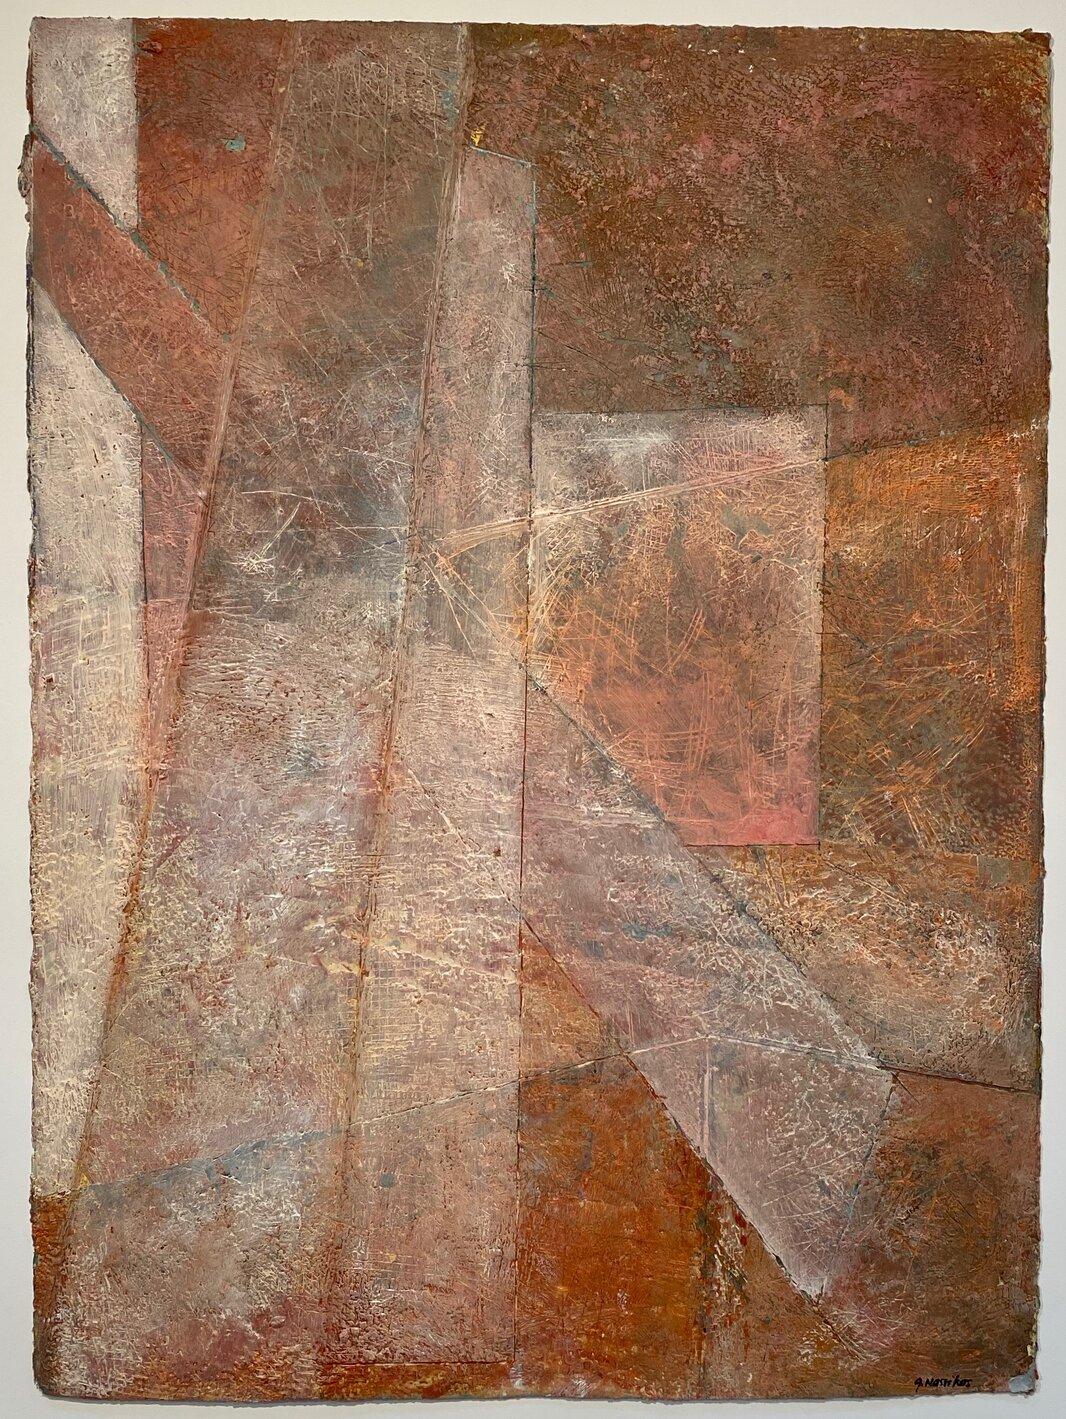 arctic shards iv encaustic on paper 30x22